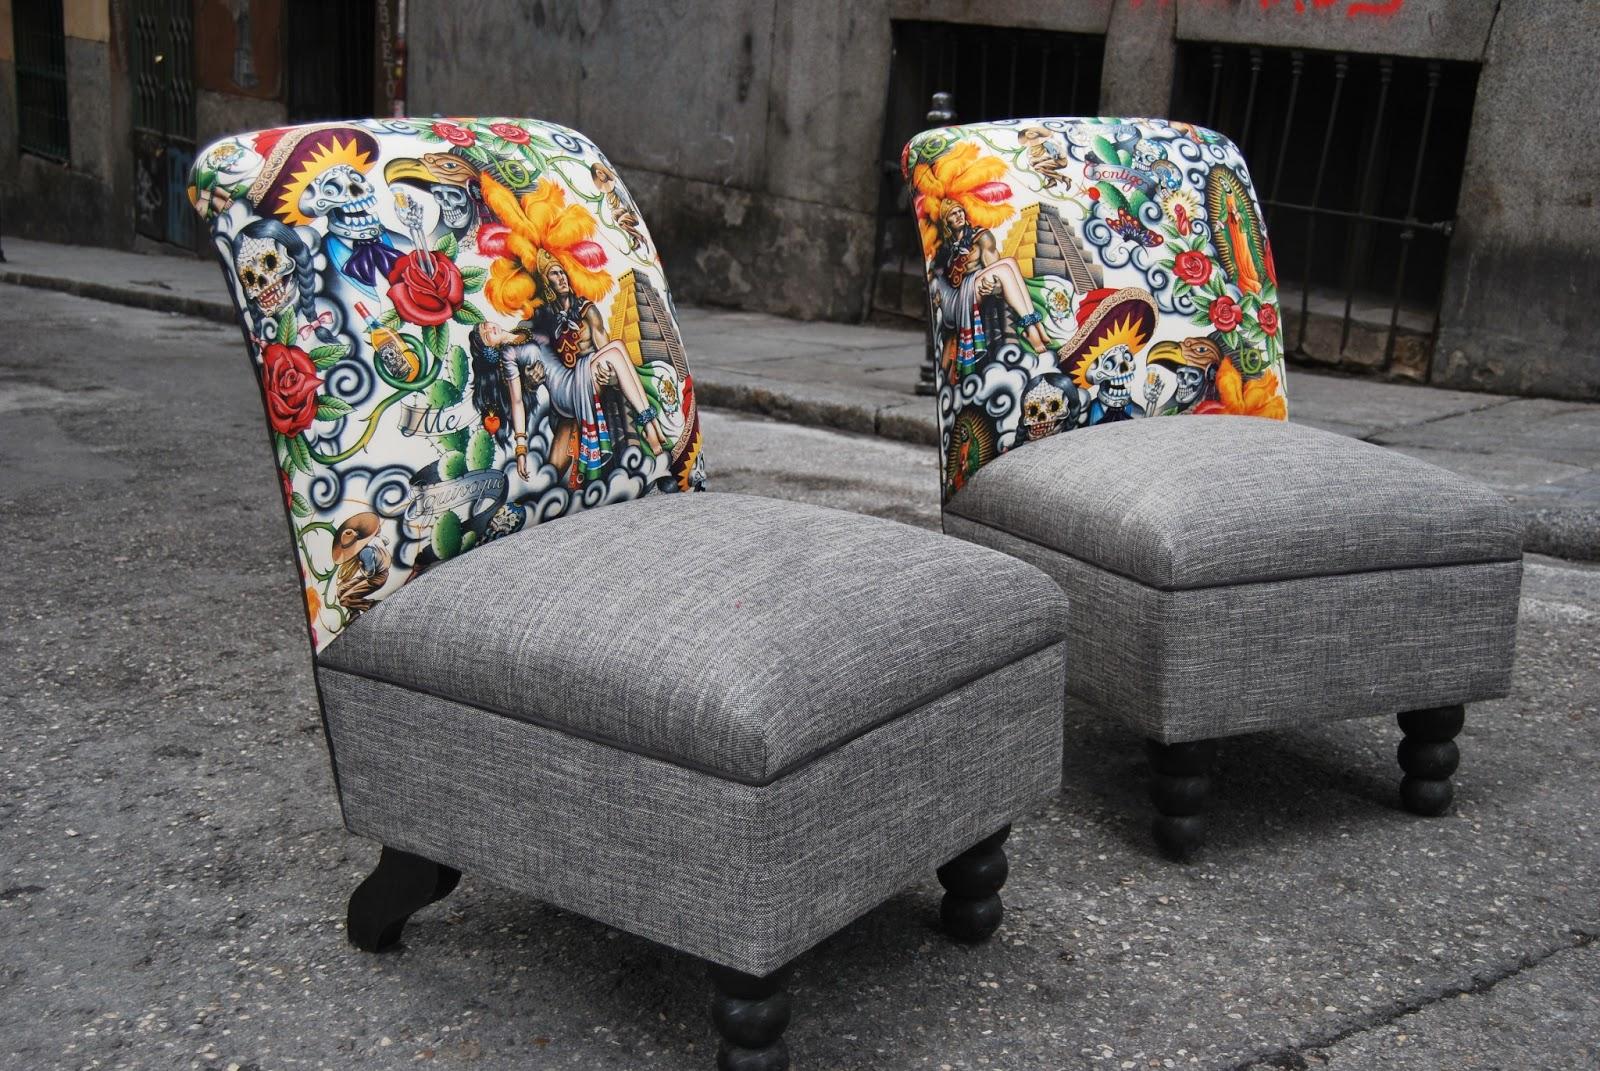 La tapicera descalzadoras mex - Telas de tapizado ...